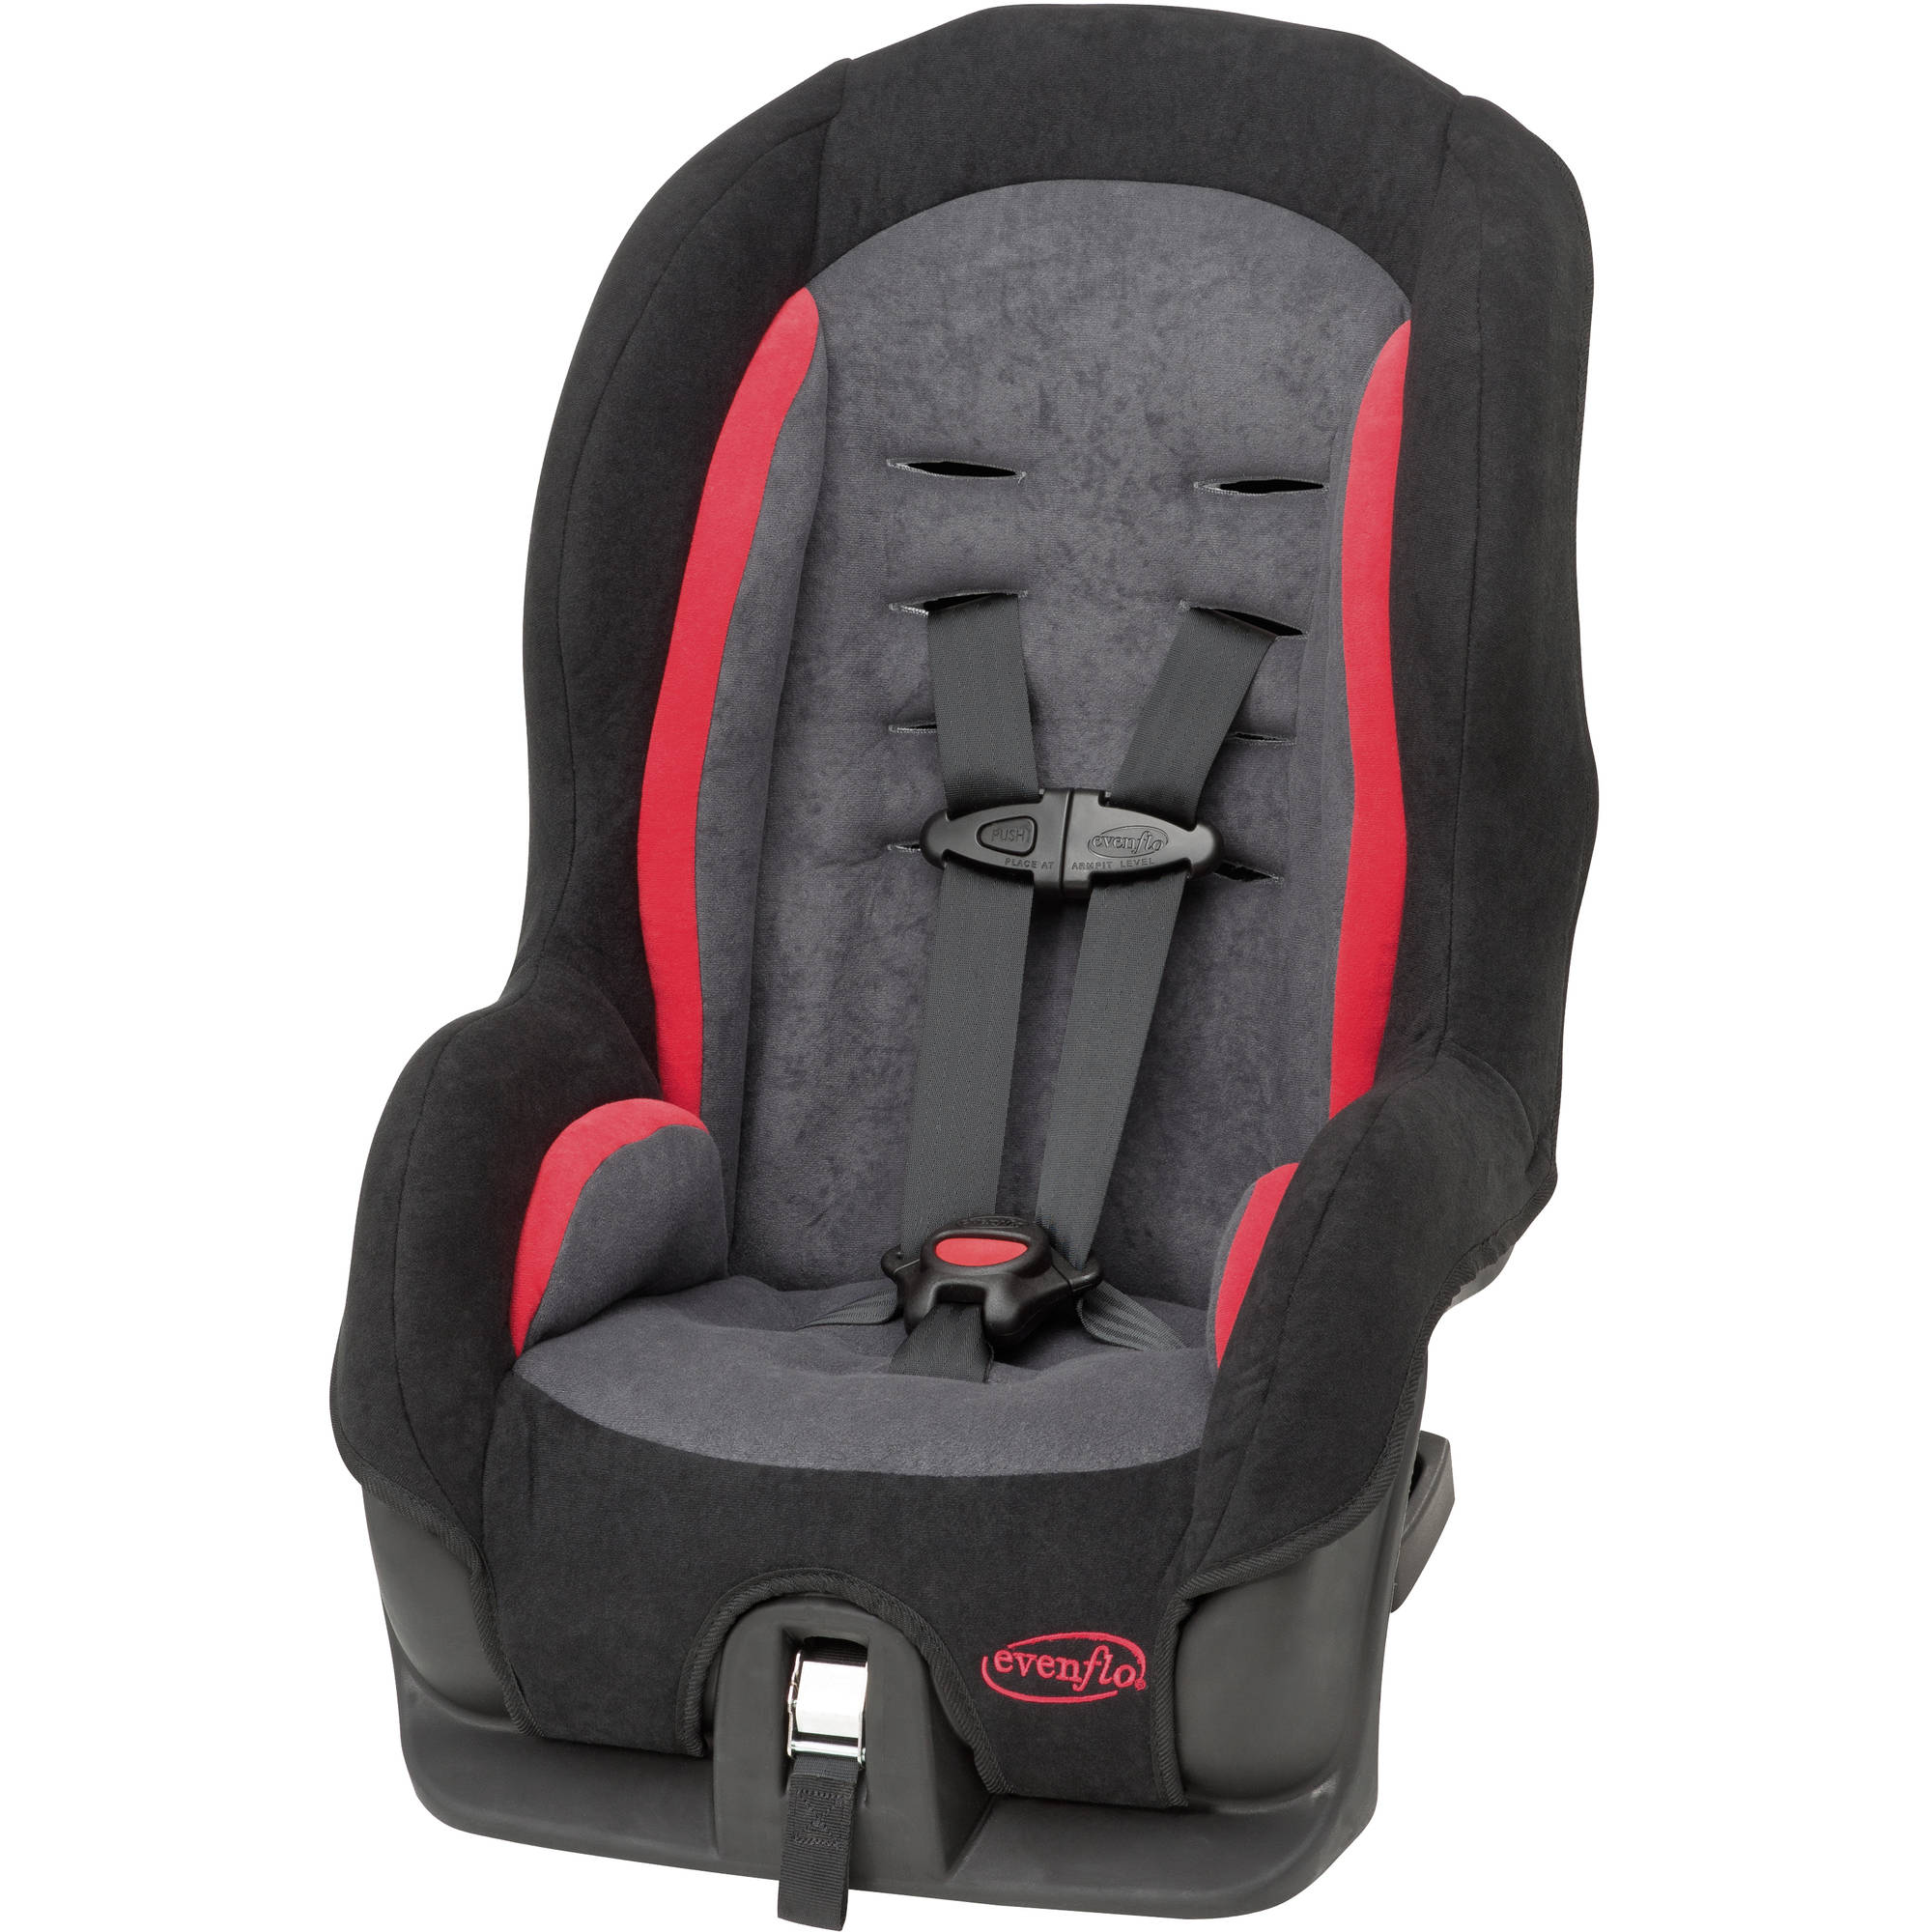 Evenflo - Tribute Sport Convertible Car Seat, Gunther